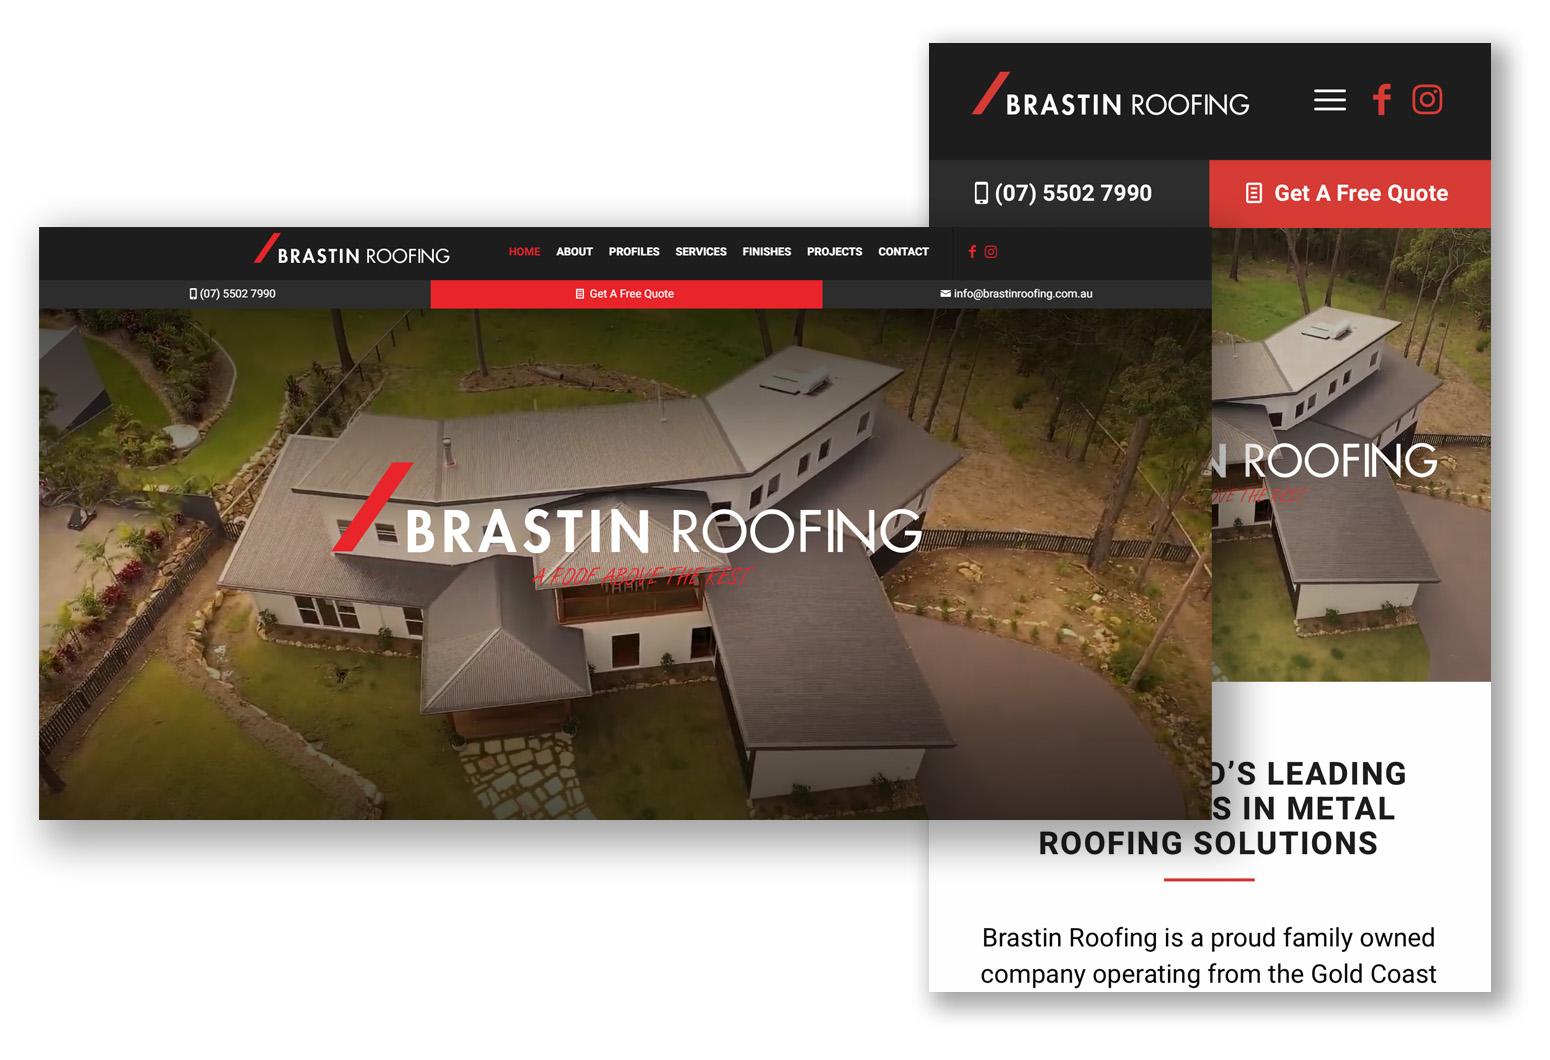 Brastin Roofing Website Design